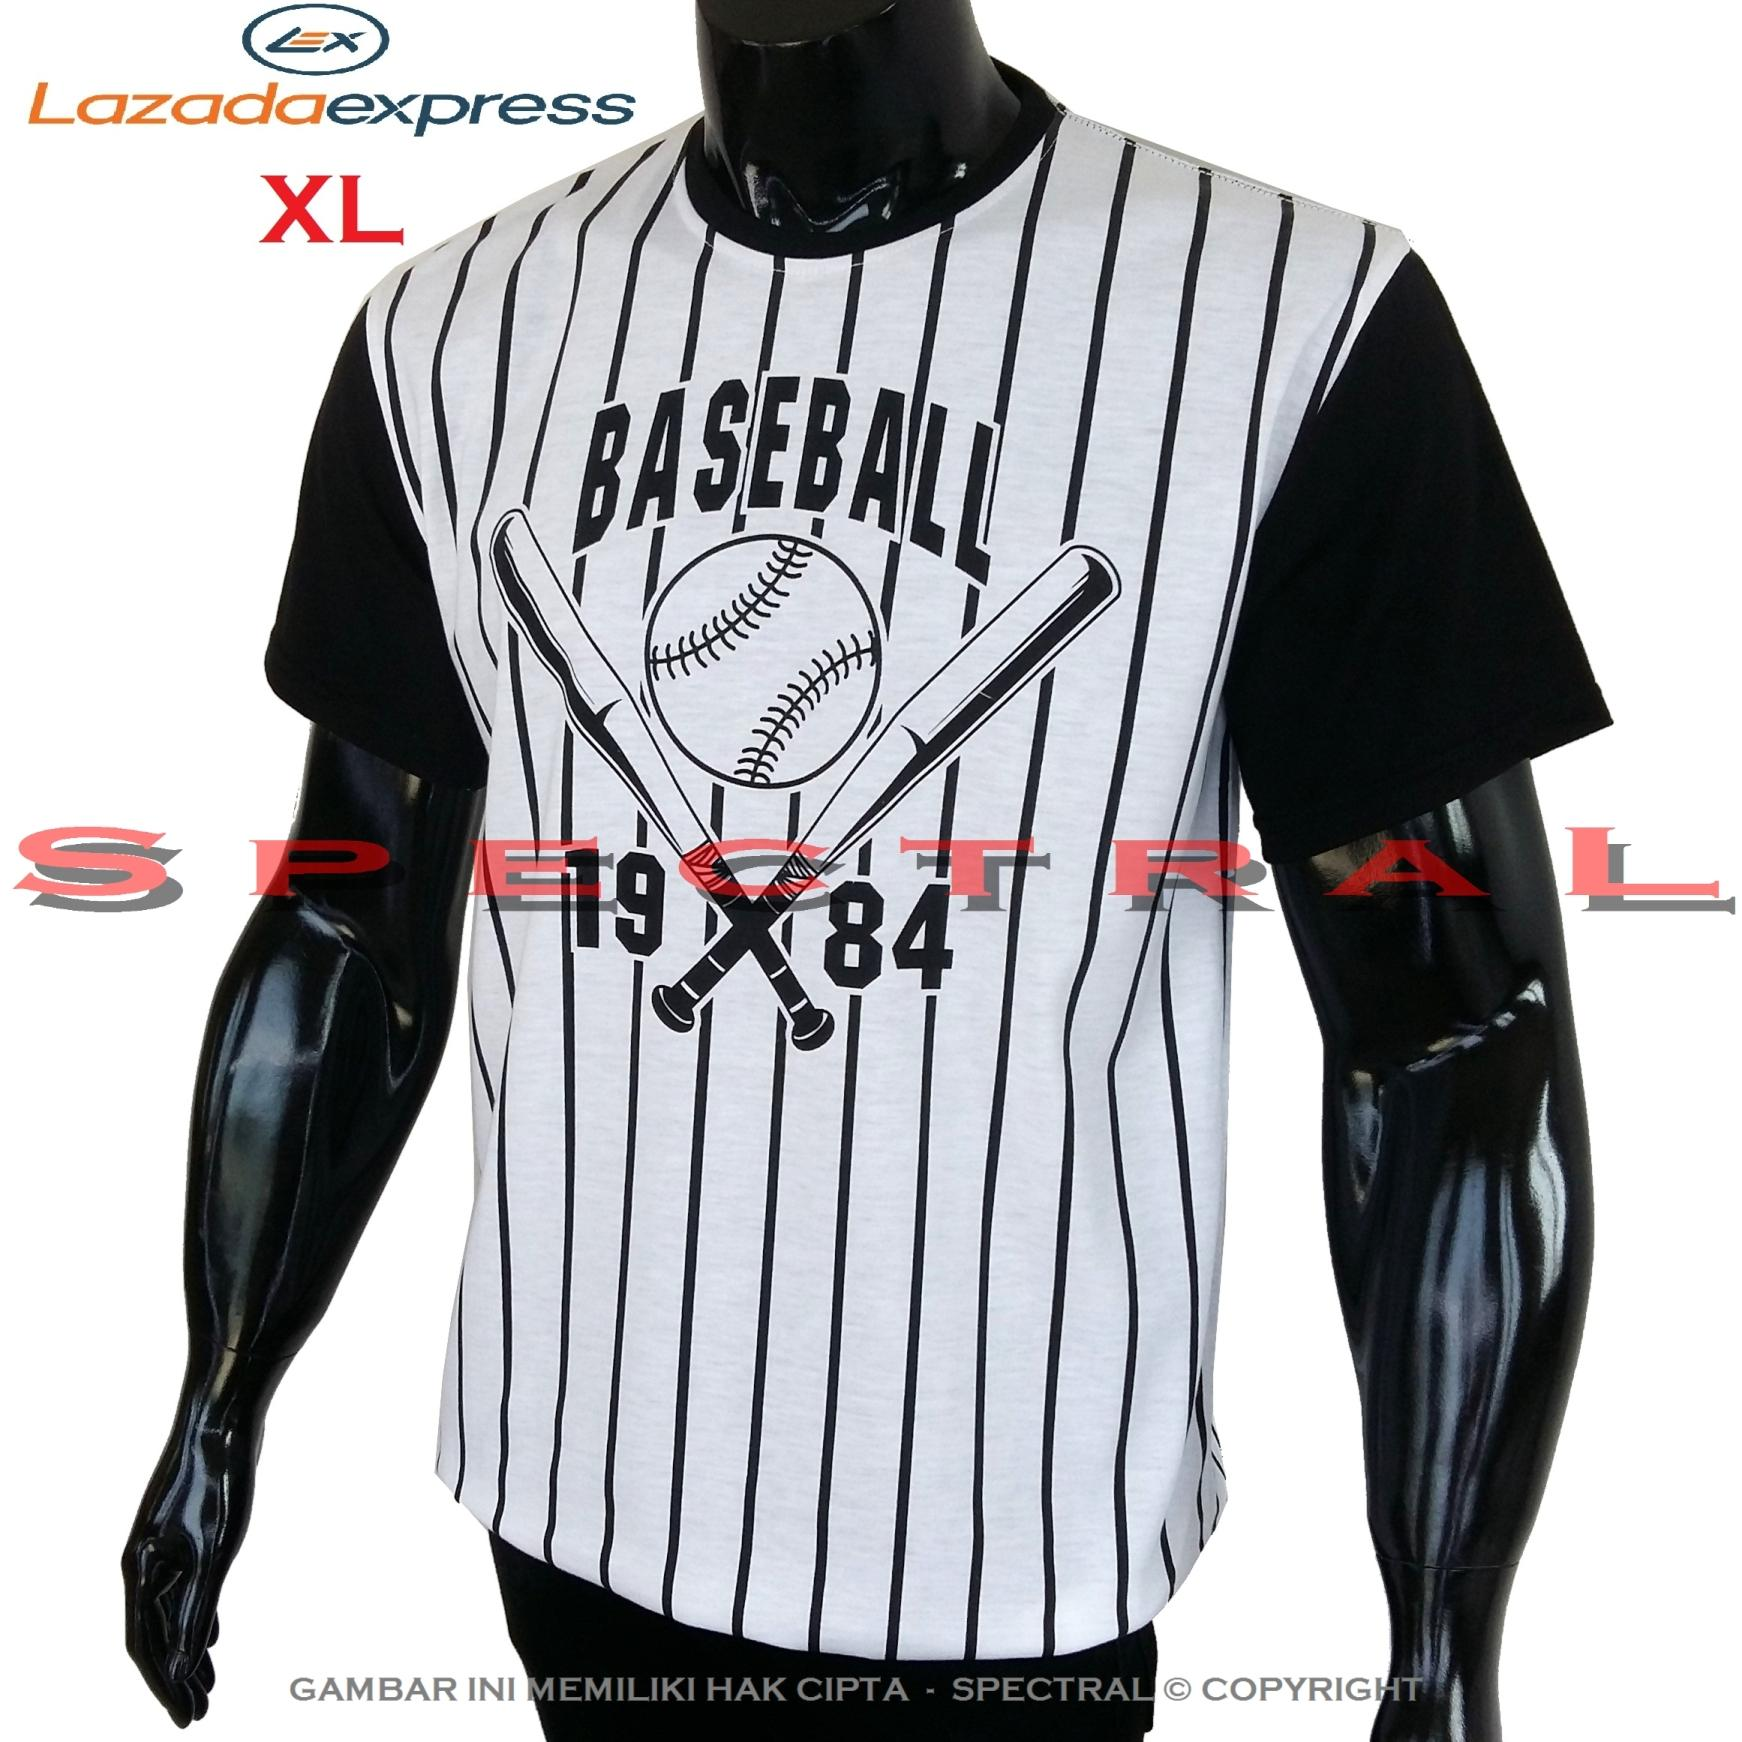 Spectral – Kaos L / XL Baseball Distro Fashion T-Shirt Cotton Pria Wanita Cewe Cowo Baju Pakaian Olahraga Sport Ukuran Besar Rap Hop Hiphop Atasan Keren Murah Bagus Jakarta Bandung Kekinian Jaman Tulisan Bisbol Basket Salur Putih